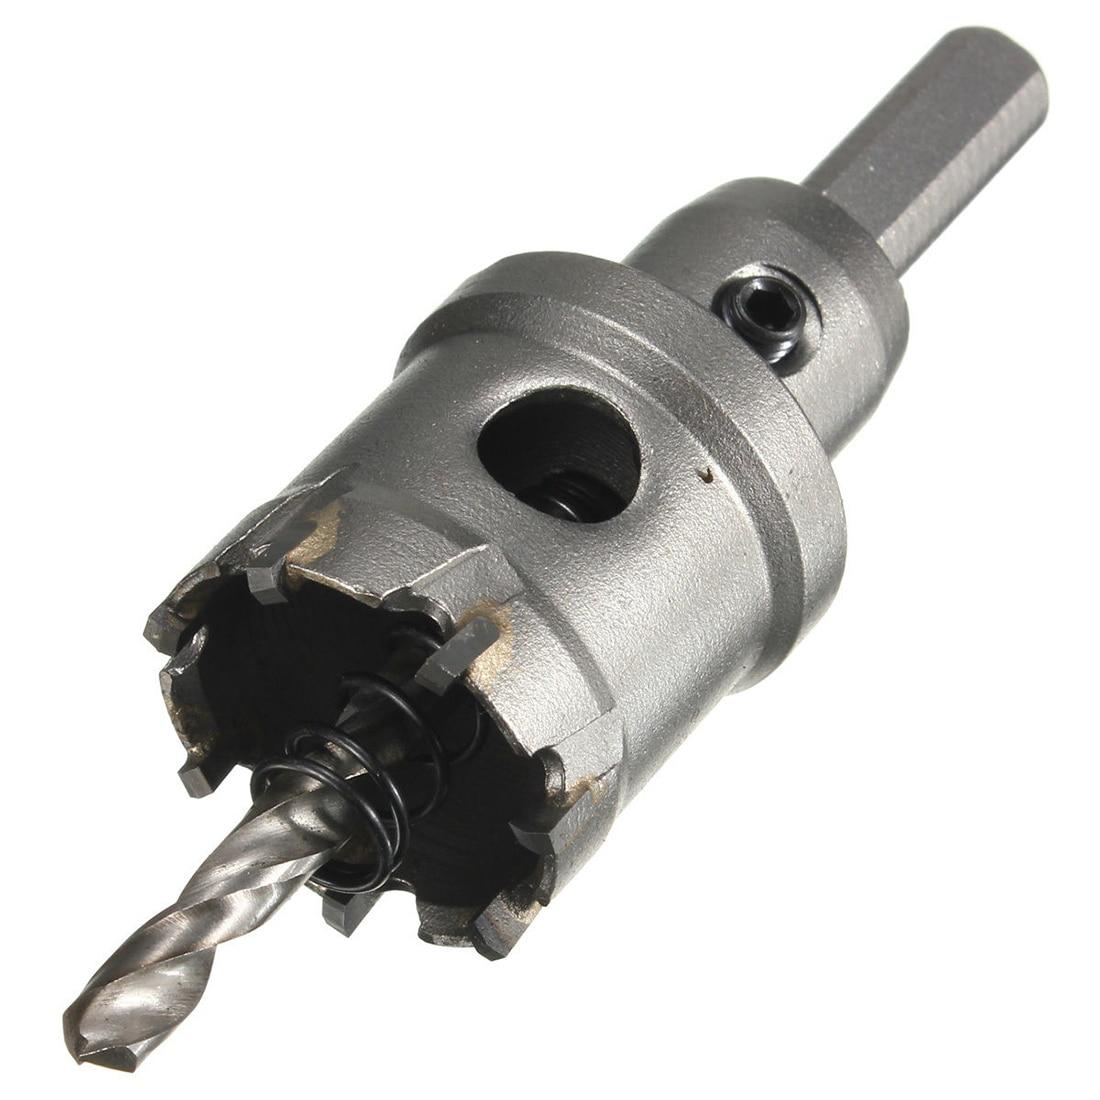 CNIM Hot Carbide Tip Metal Cutter Stainless Steel HSS Drill Bit Hole Saw Holesaw Size:38mm